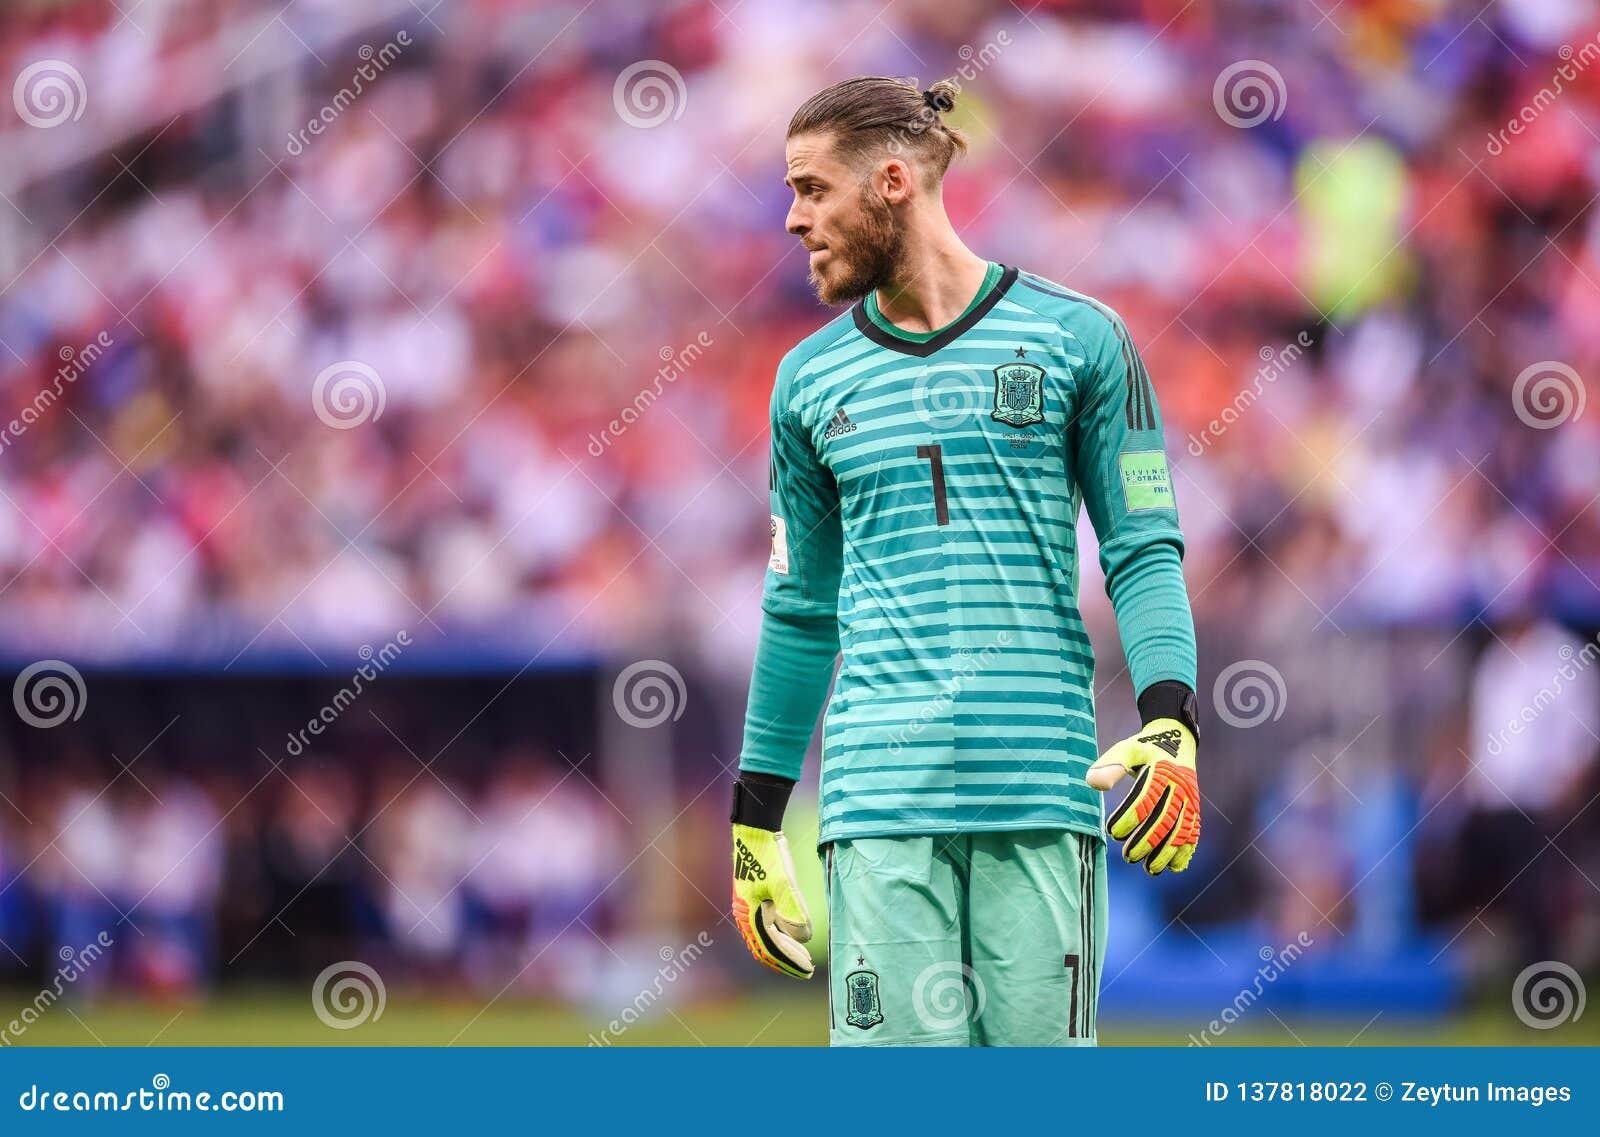 e47300fc5 Spain National Football Team Goalkeeper David De Gea Editorial ...